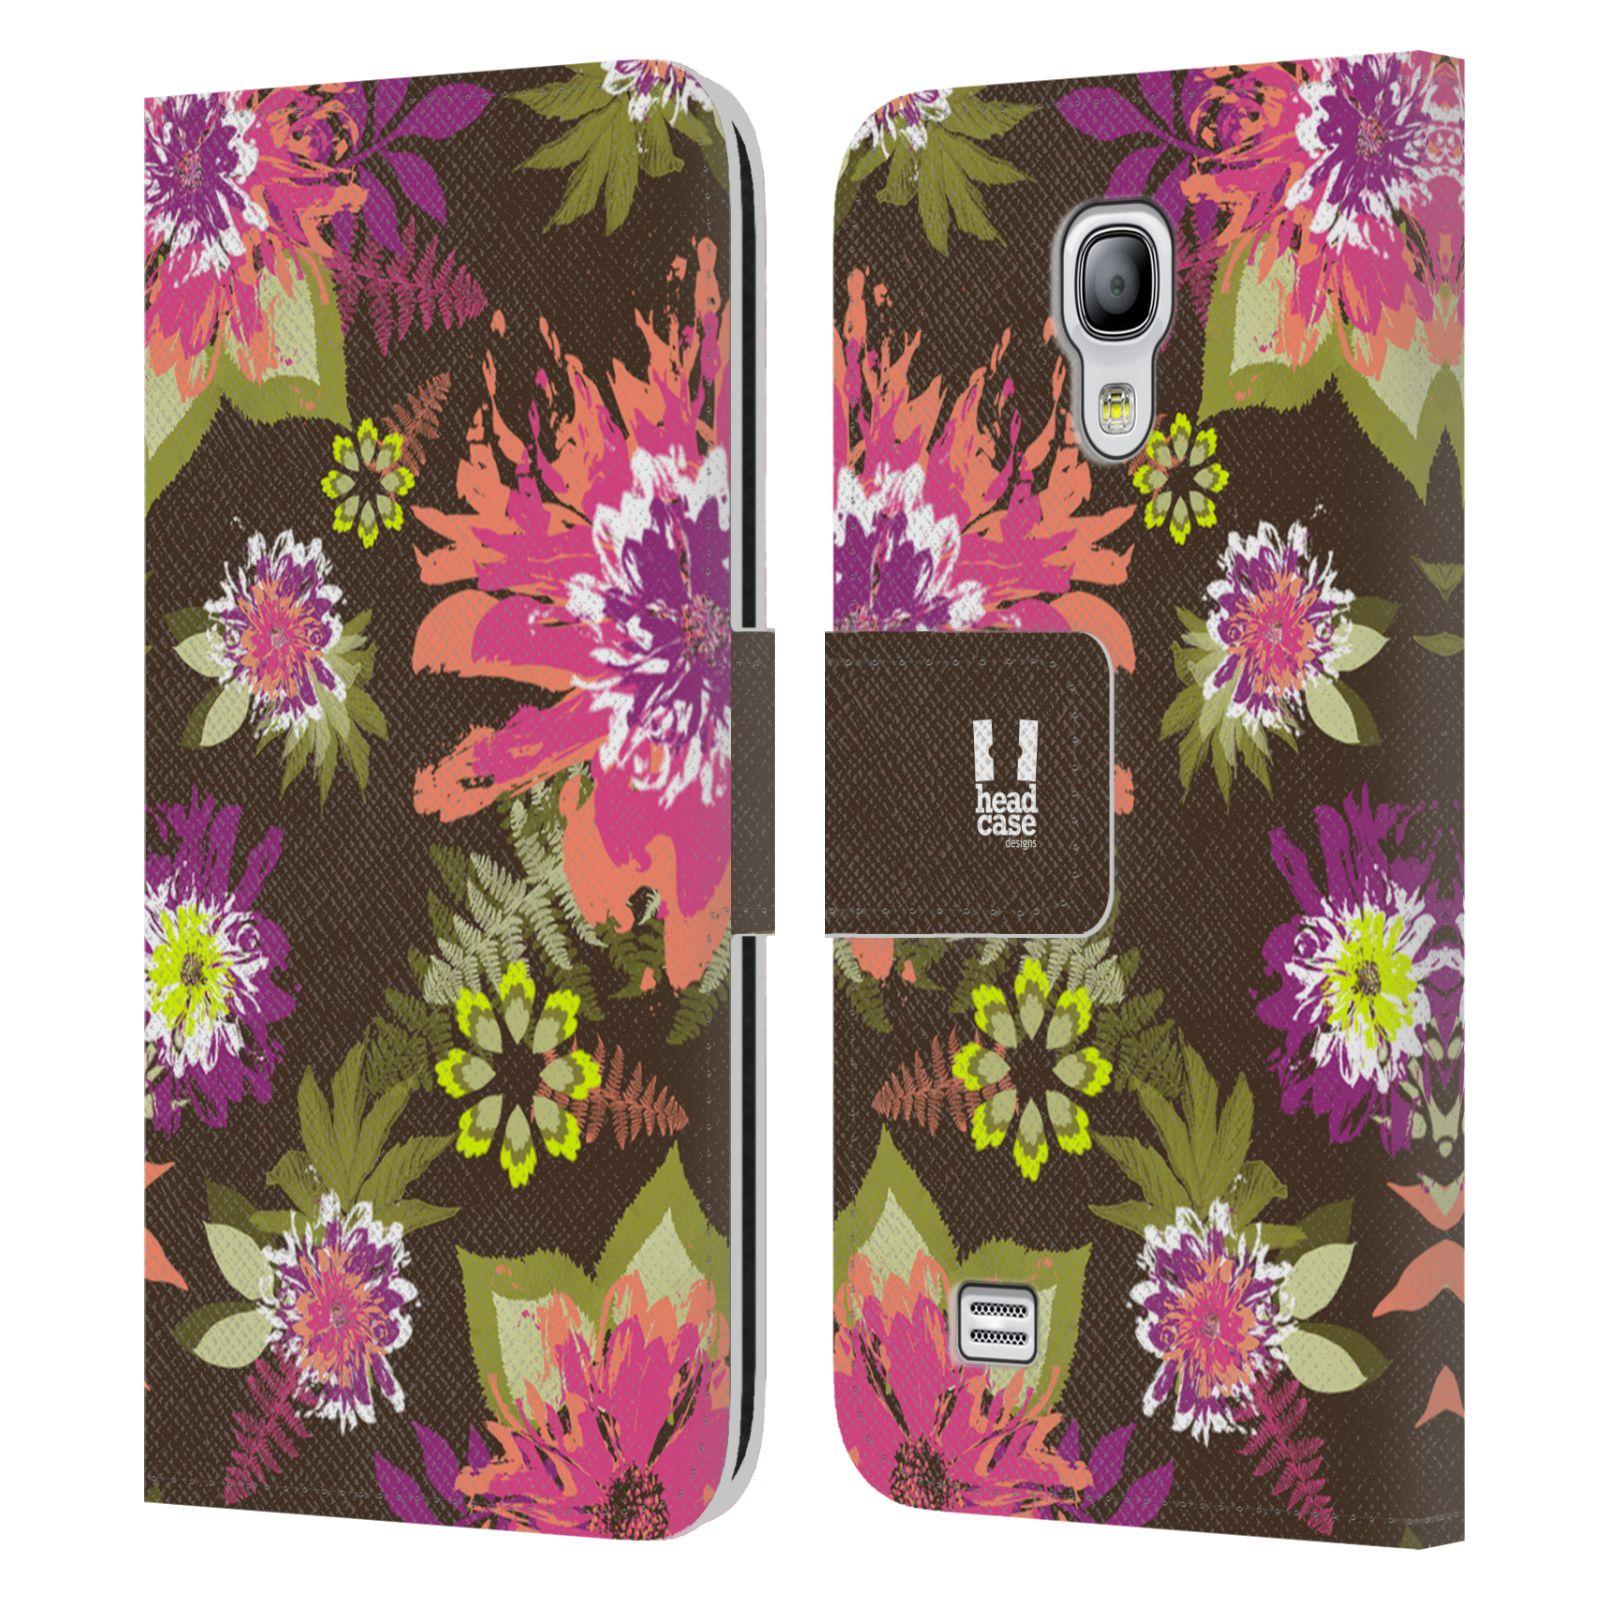 HEAD CASE Flipové pouzdro pro mobil Samsung Galaxy S4 MINI / S4 MINI DUOS BOTANIKA barevné květy zelená